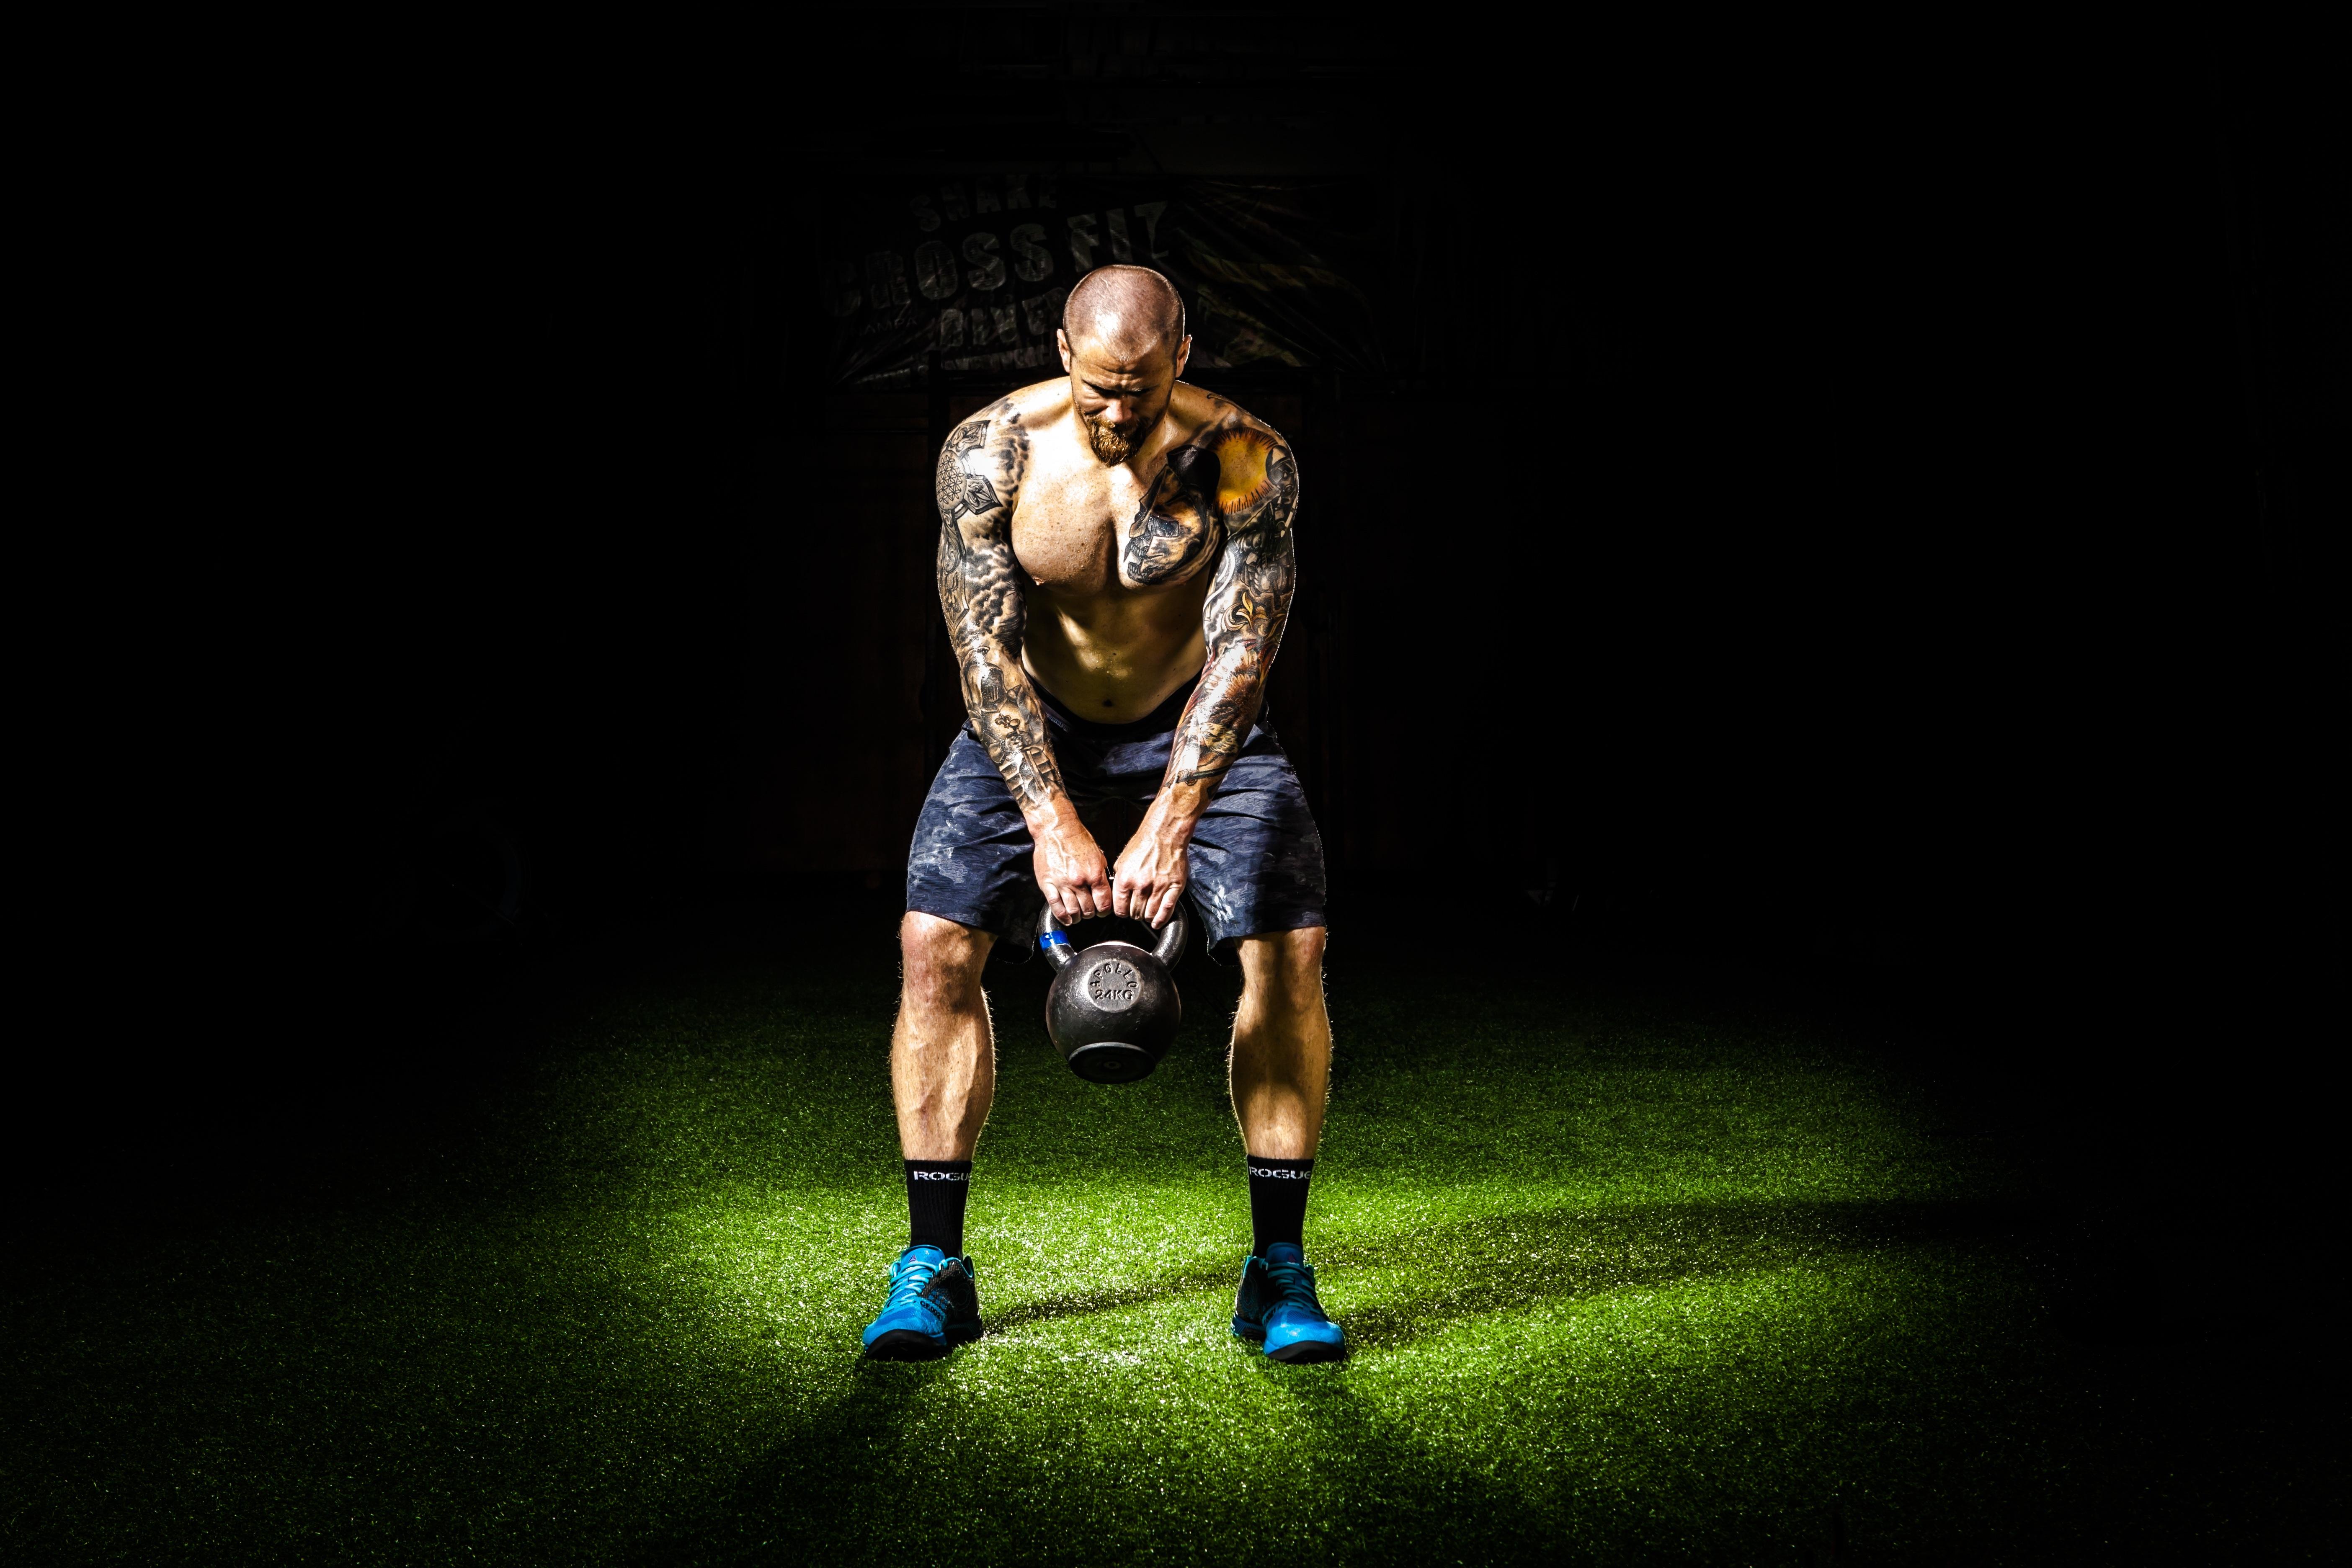 Free Images : dark, effort, exercise, fitness, gym, man ...